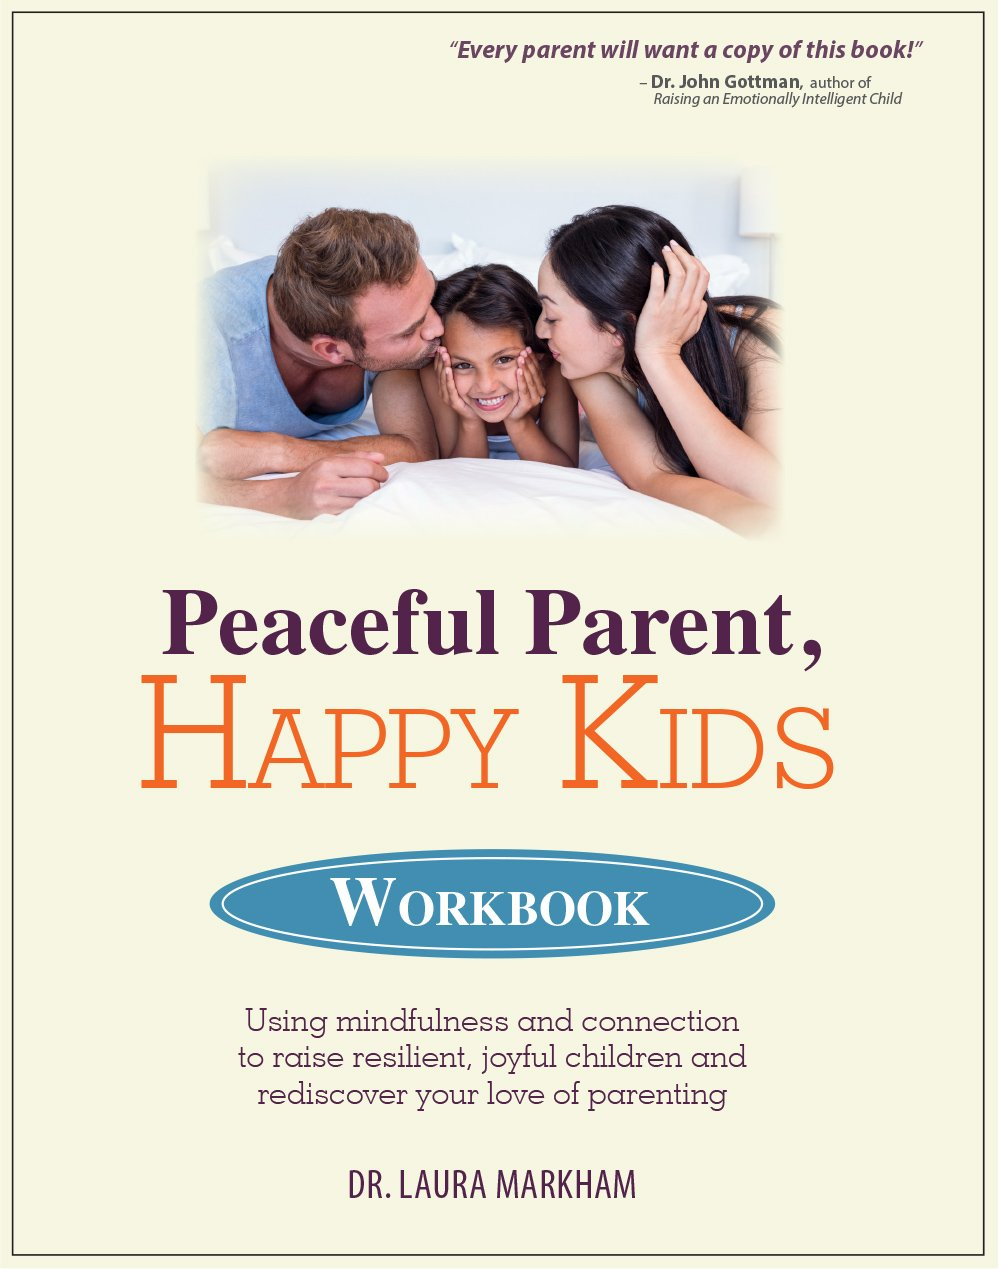 Workbooks relationship rescue workbook : Amazon.com: Dr. Laura Markham: Books, Biography, Blog, Audiobooks ...